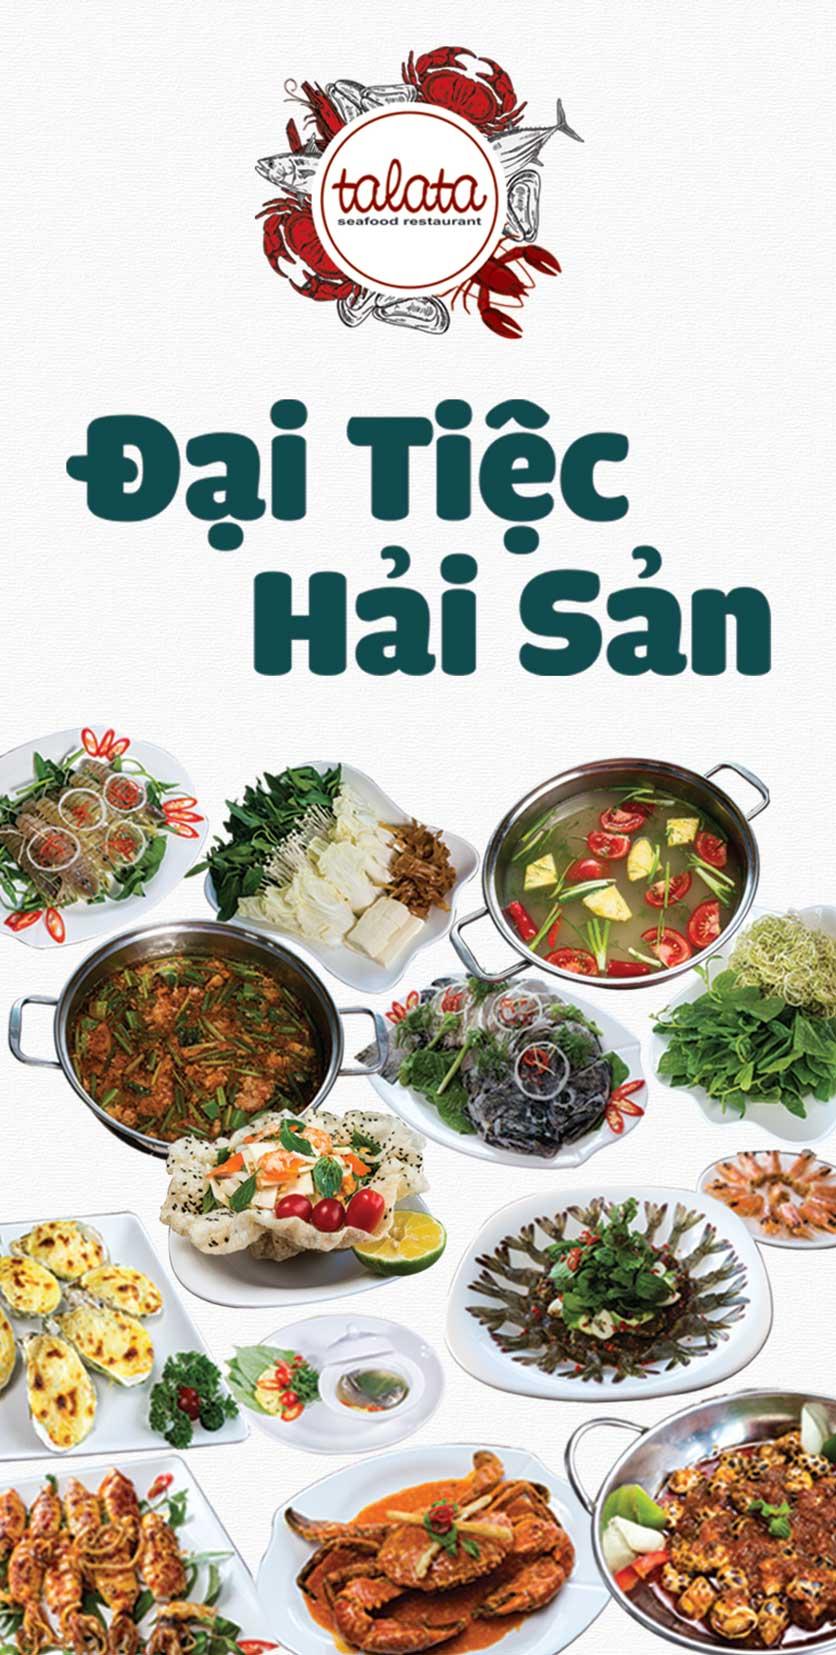 Menu Hải Sản Talata - Huỳnh Thúc Kháng 1